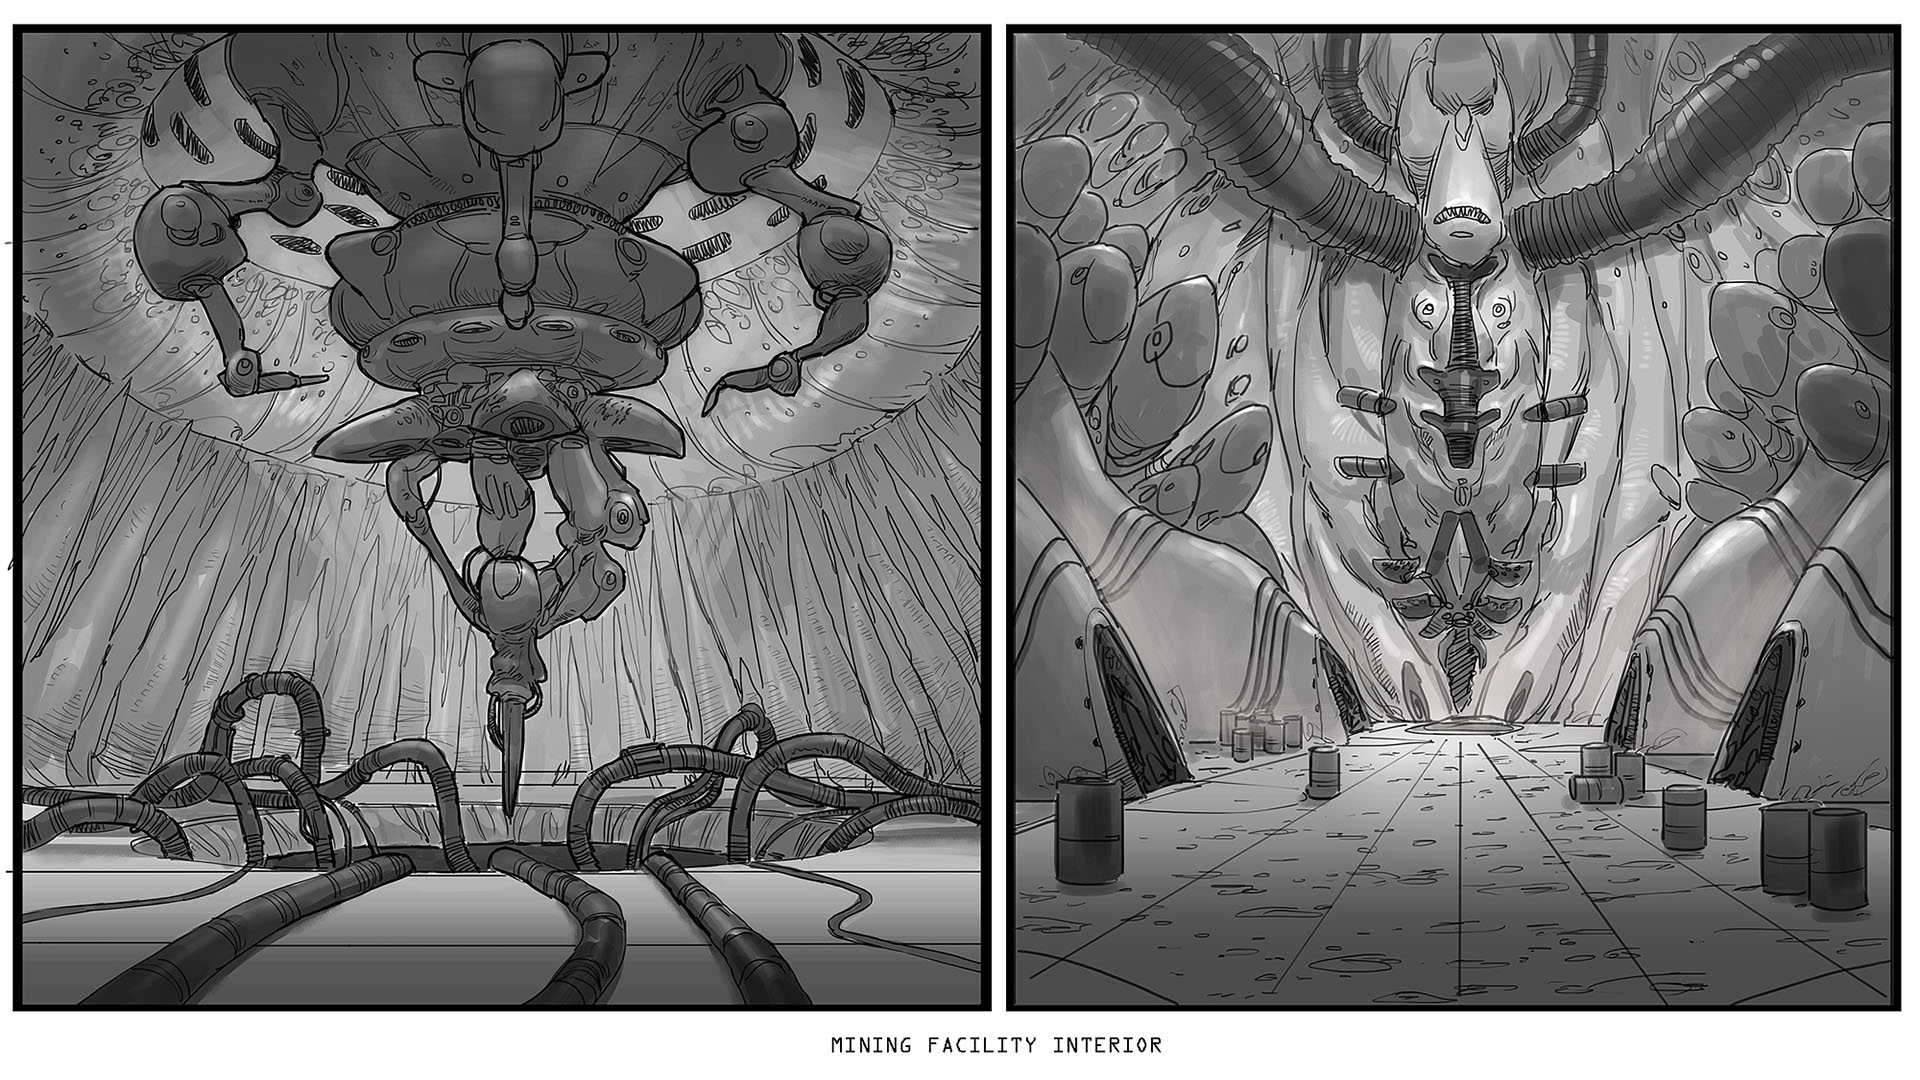 Mining interior sketches